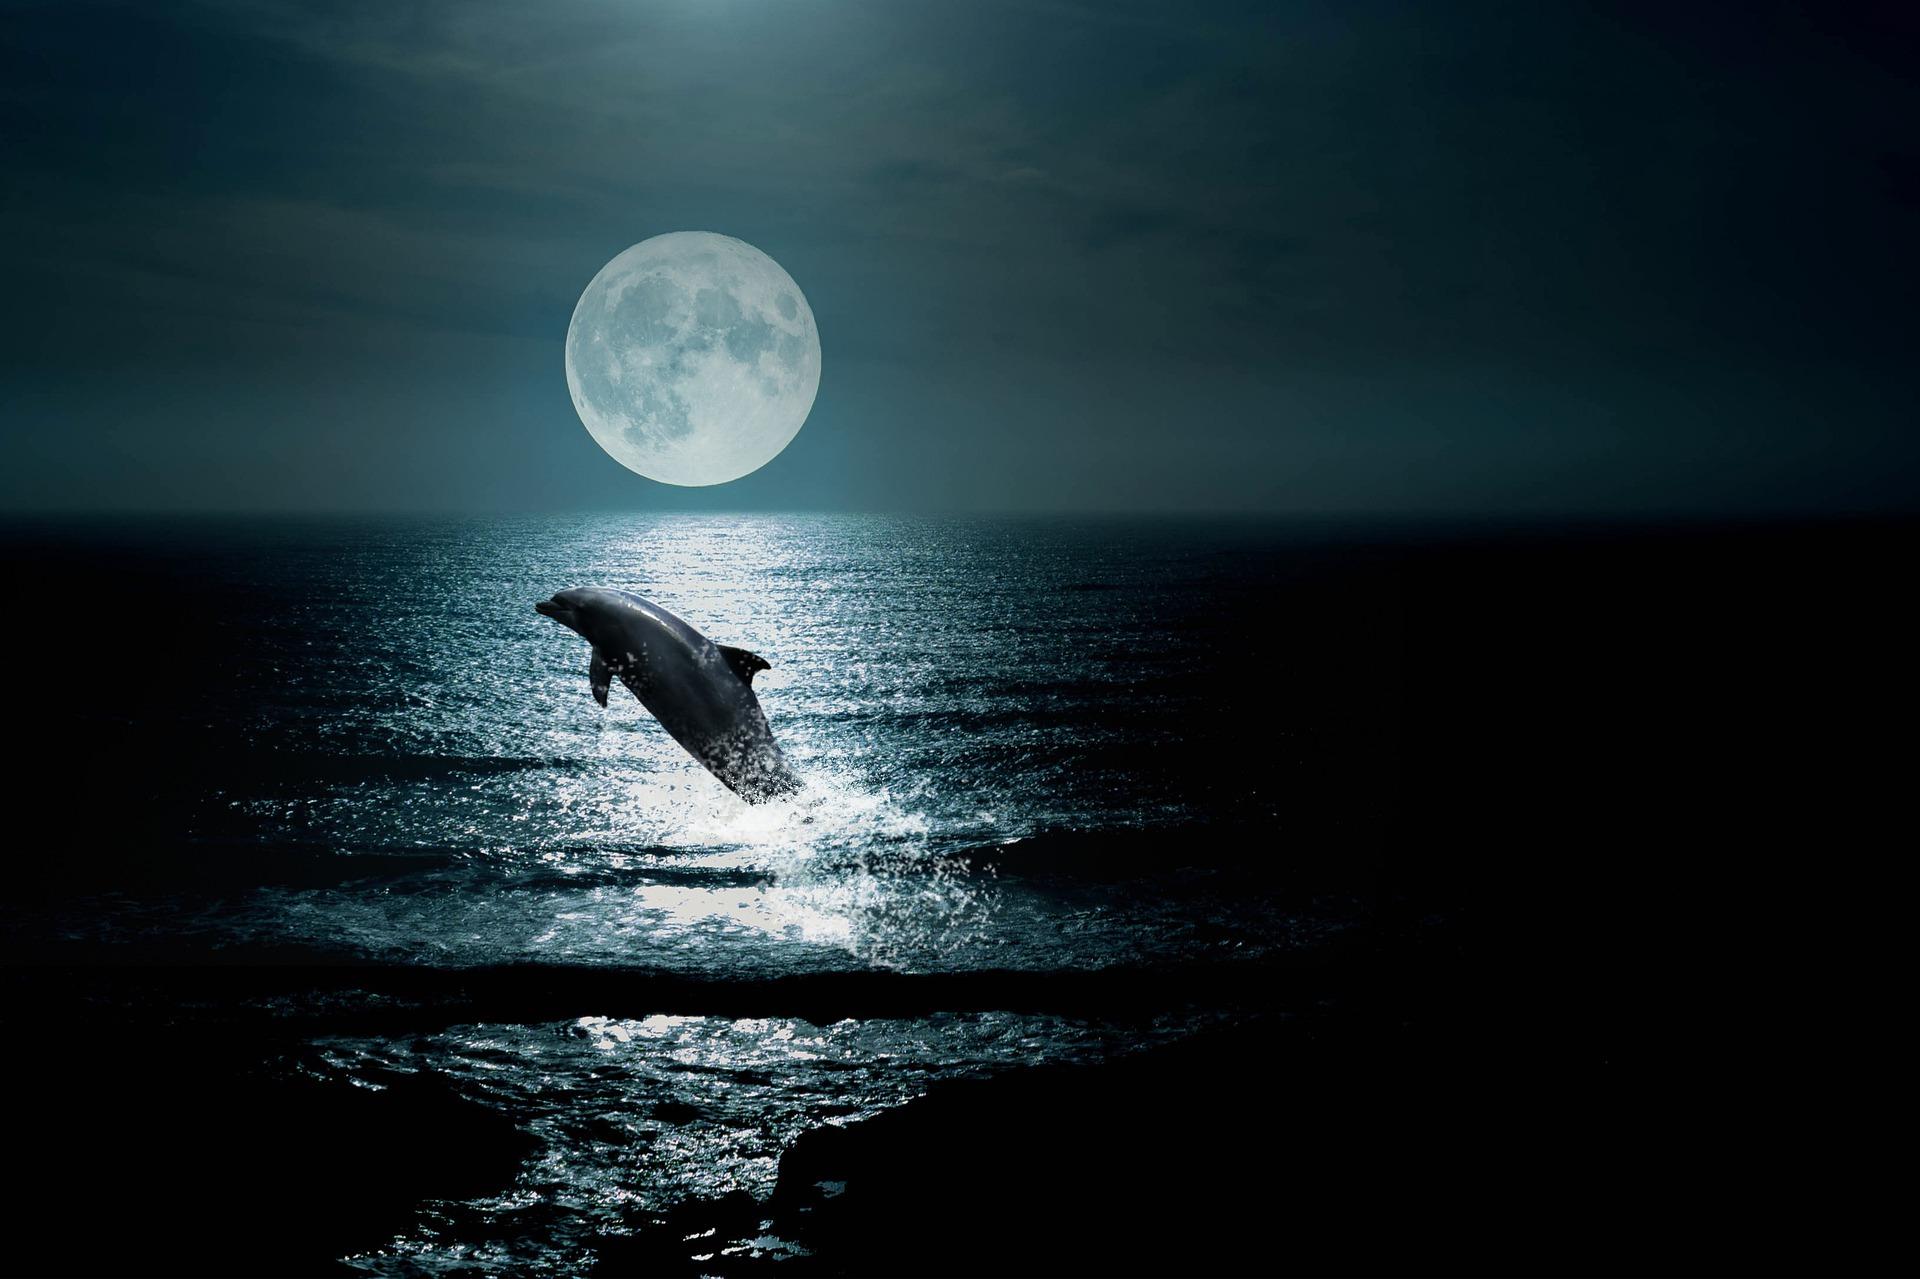 Delfin - dolphin